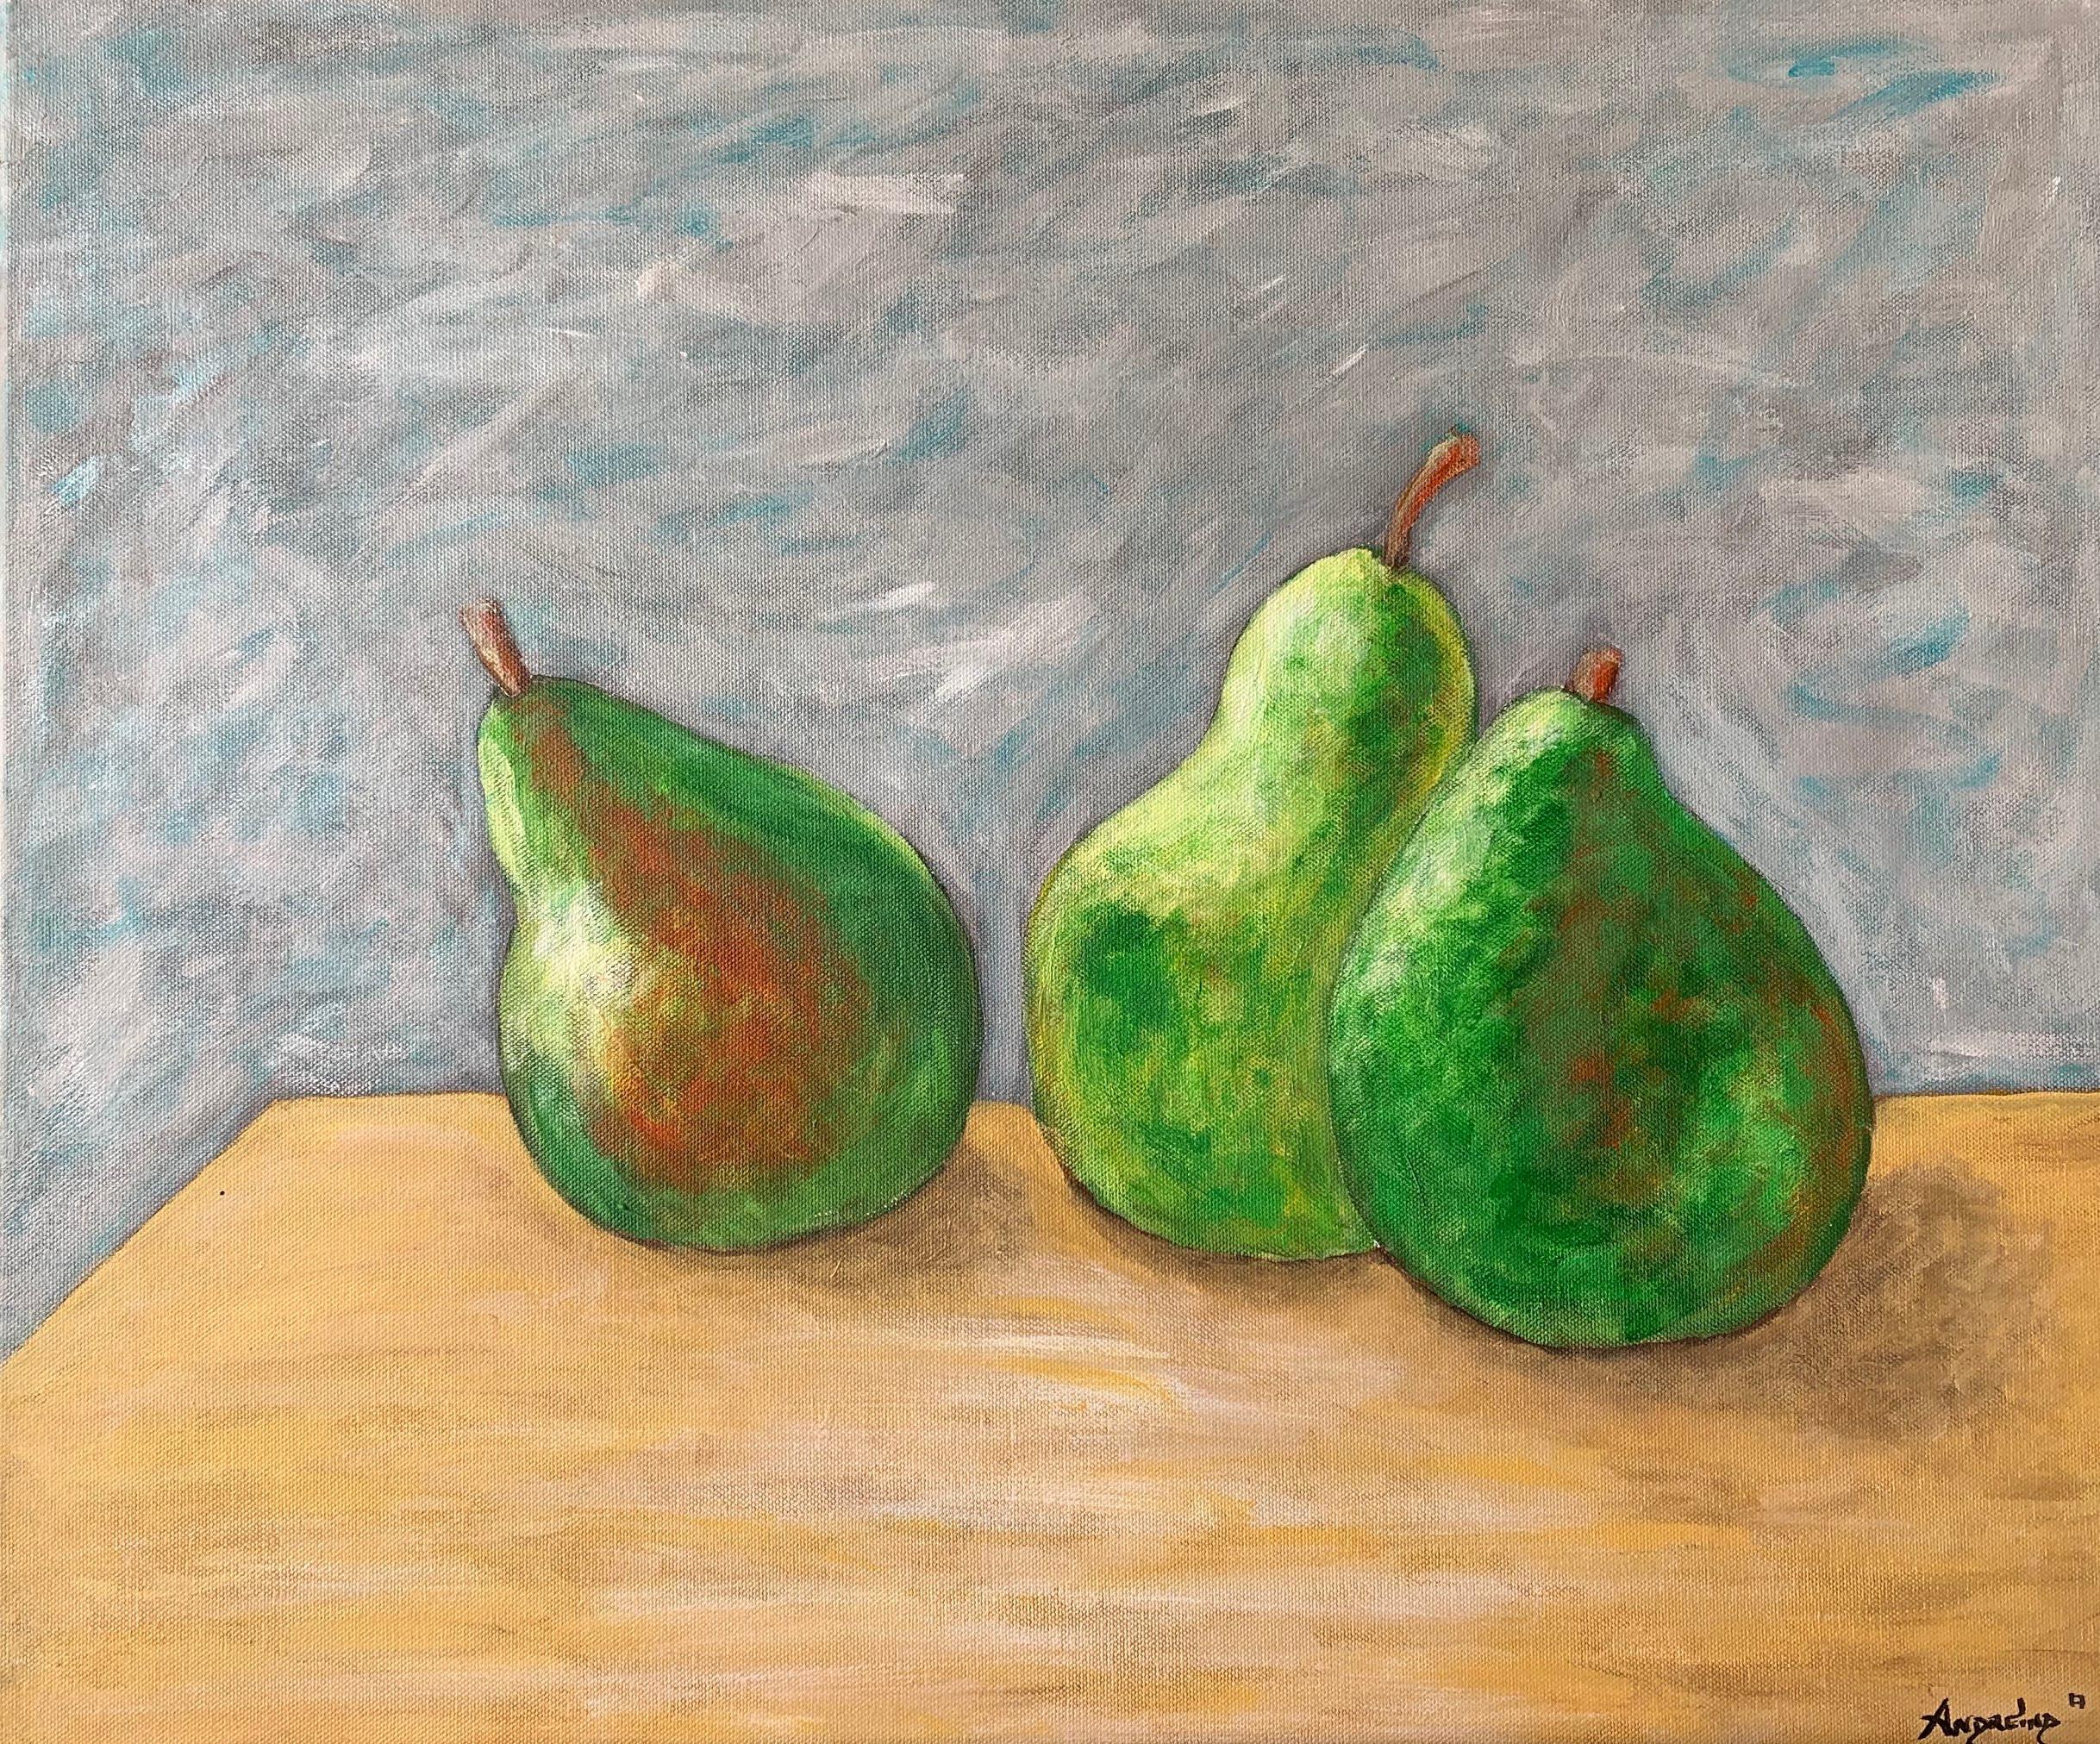 Tres peras I.20_24.2017.acrylic